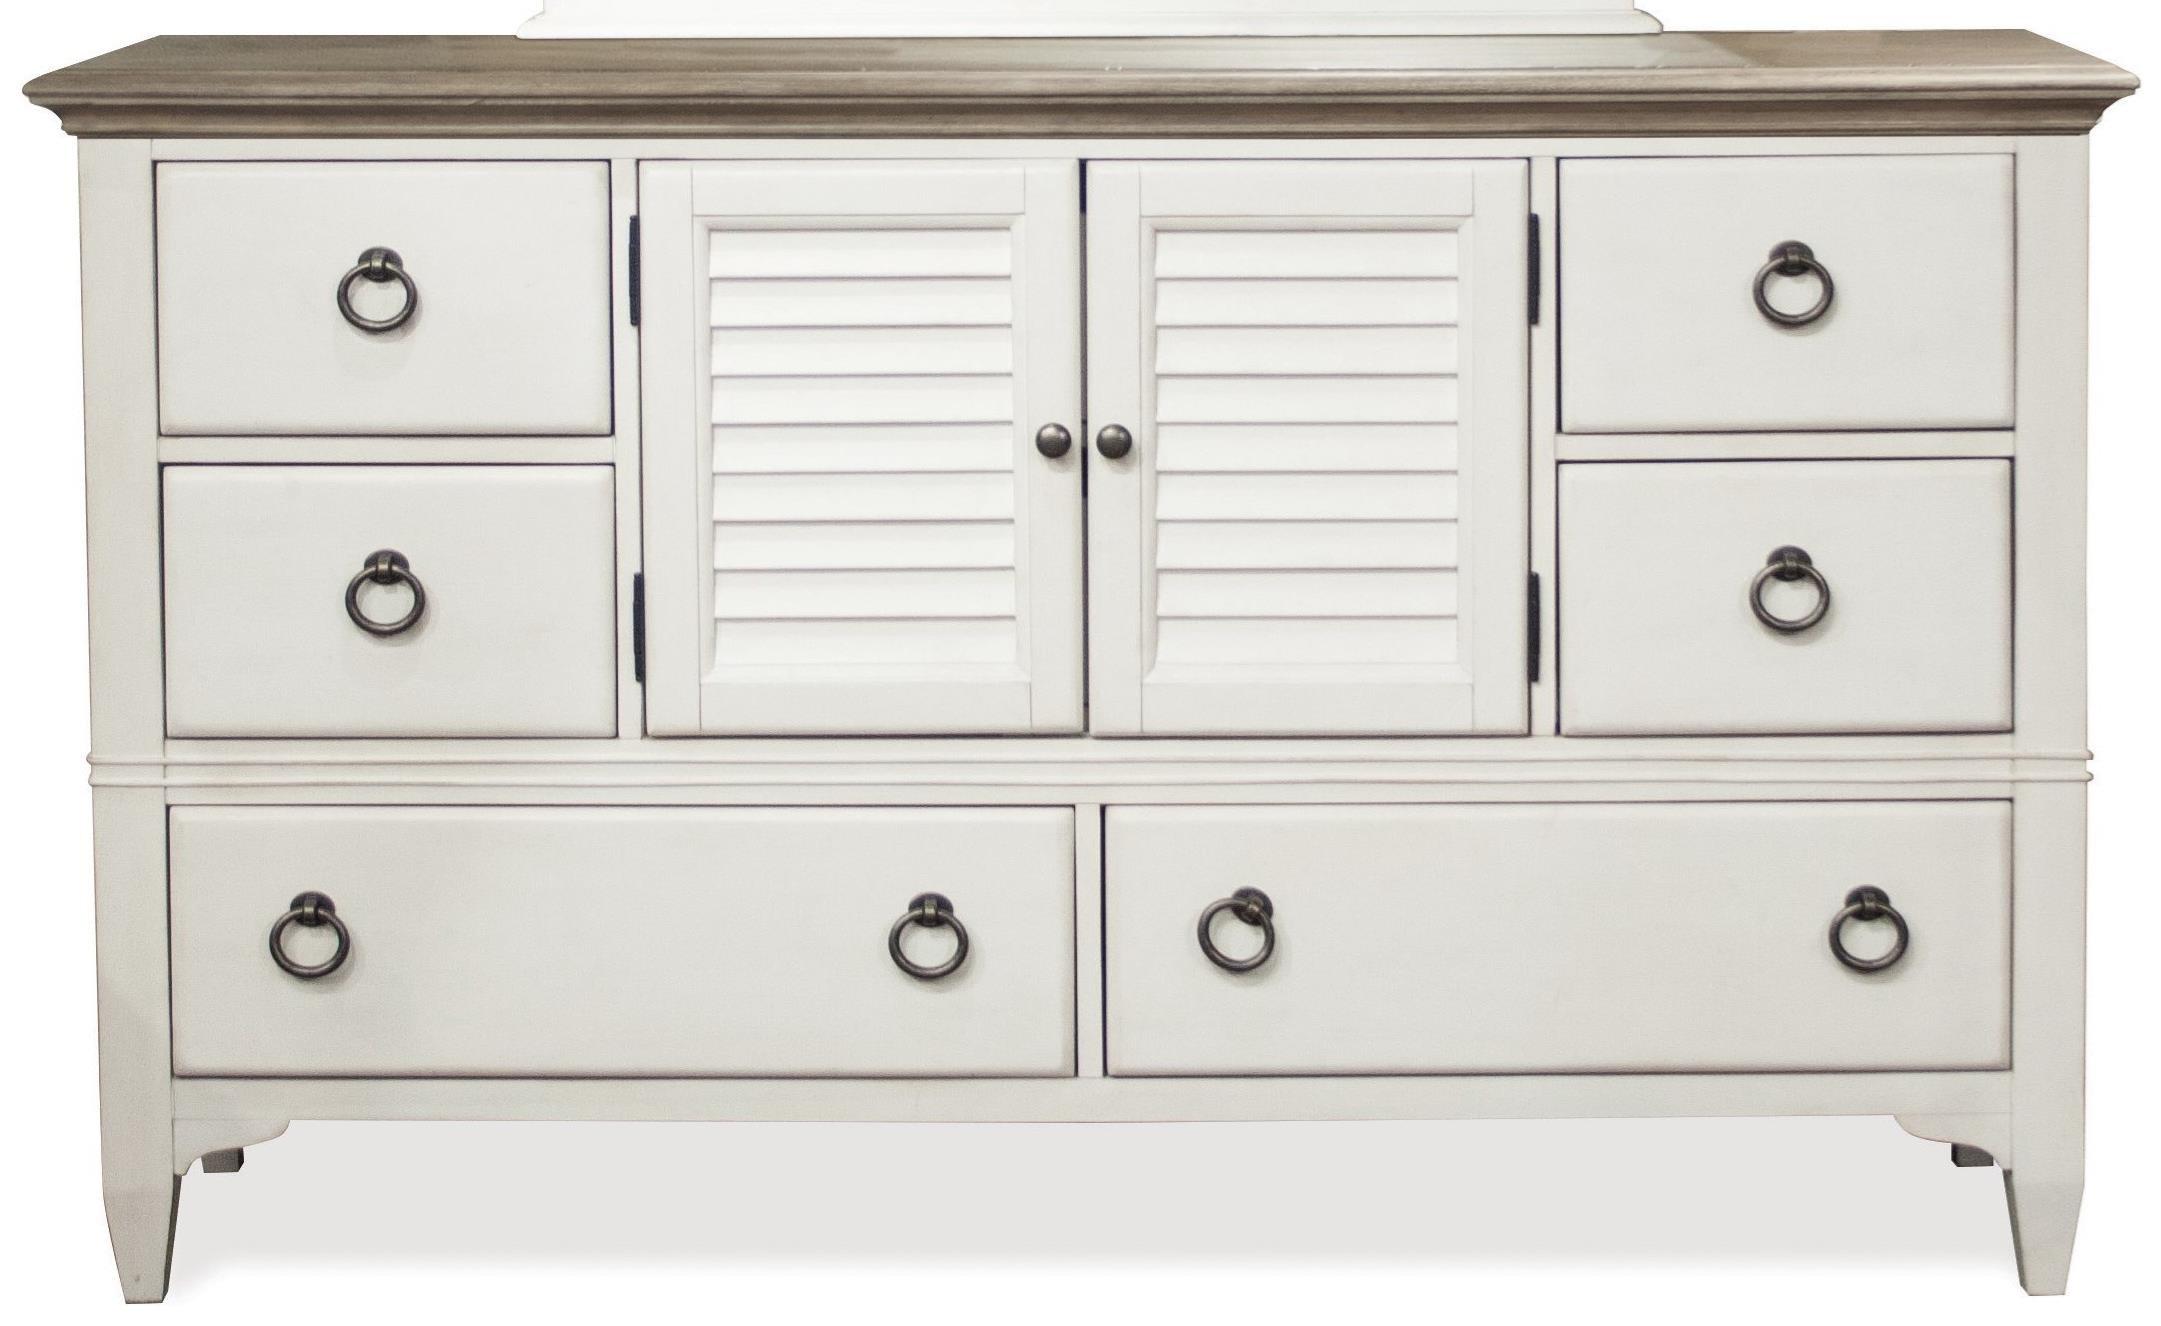 Myra Door Dresser by Riverside Furniture at Johnny Janosik